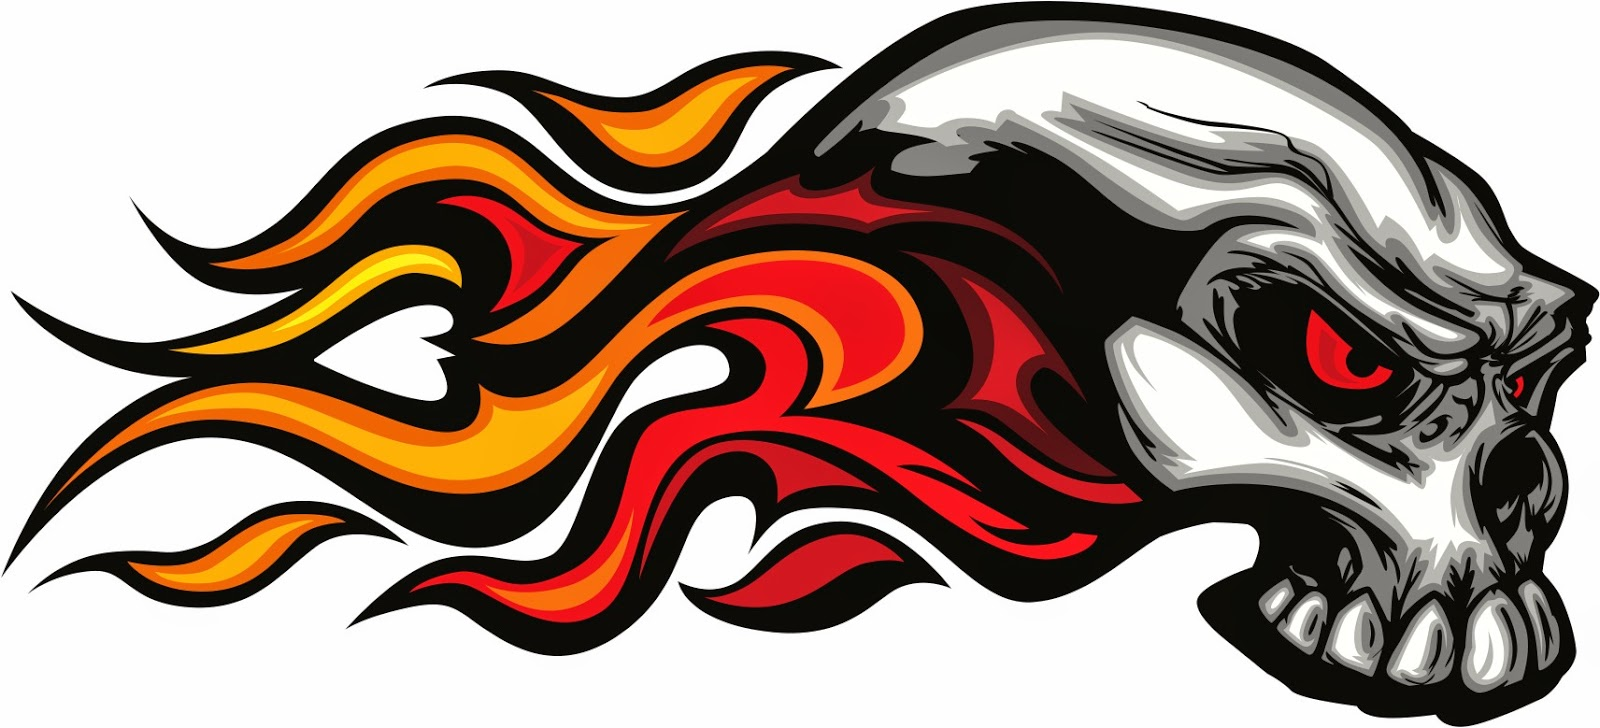 Car sticker design fire - Coimbatore For Customization